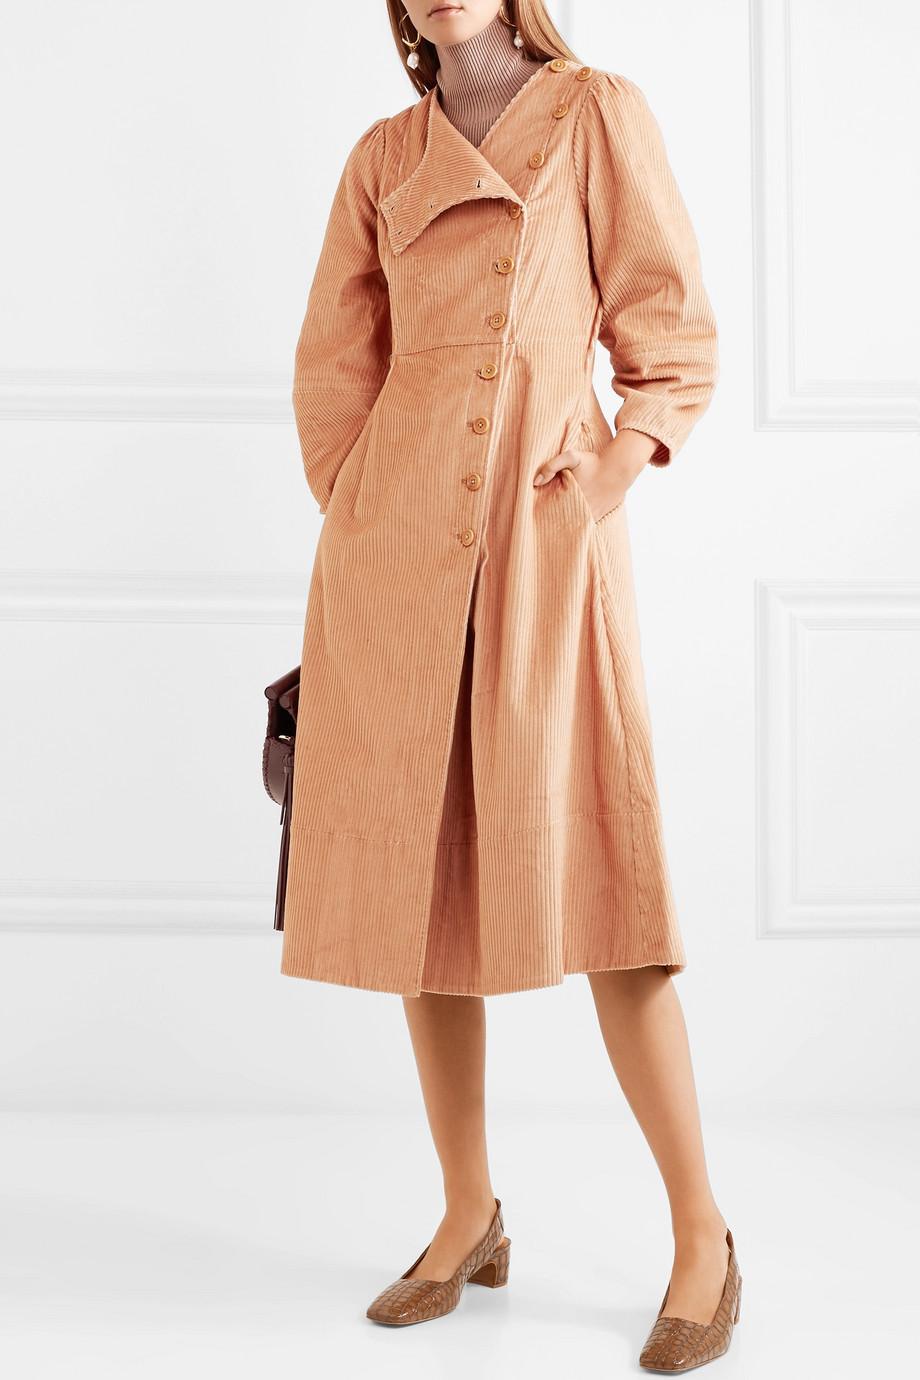 Ulla Johnson Rowan cotton-corduroy midi dress $495